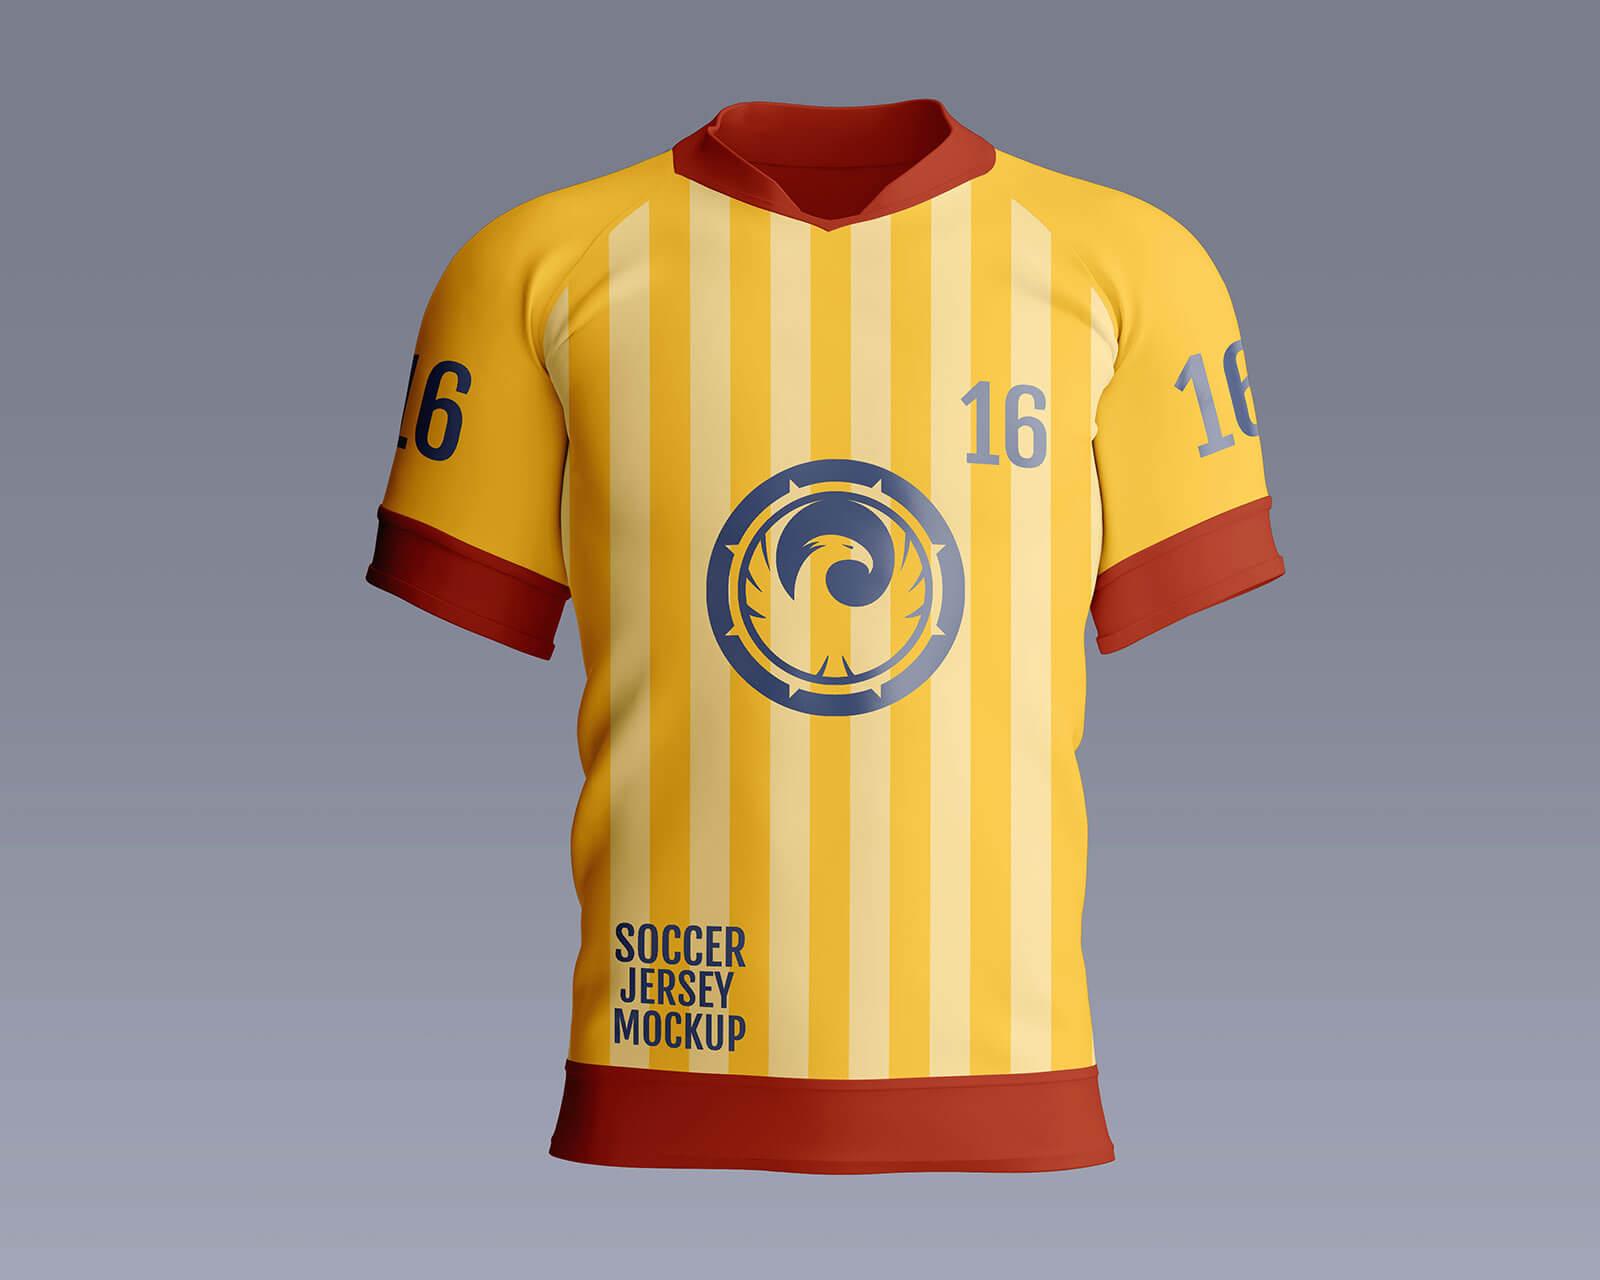 3 Free Half Sleeves Soccer Jersey Mockup PSD Set